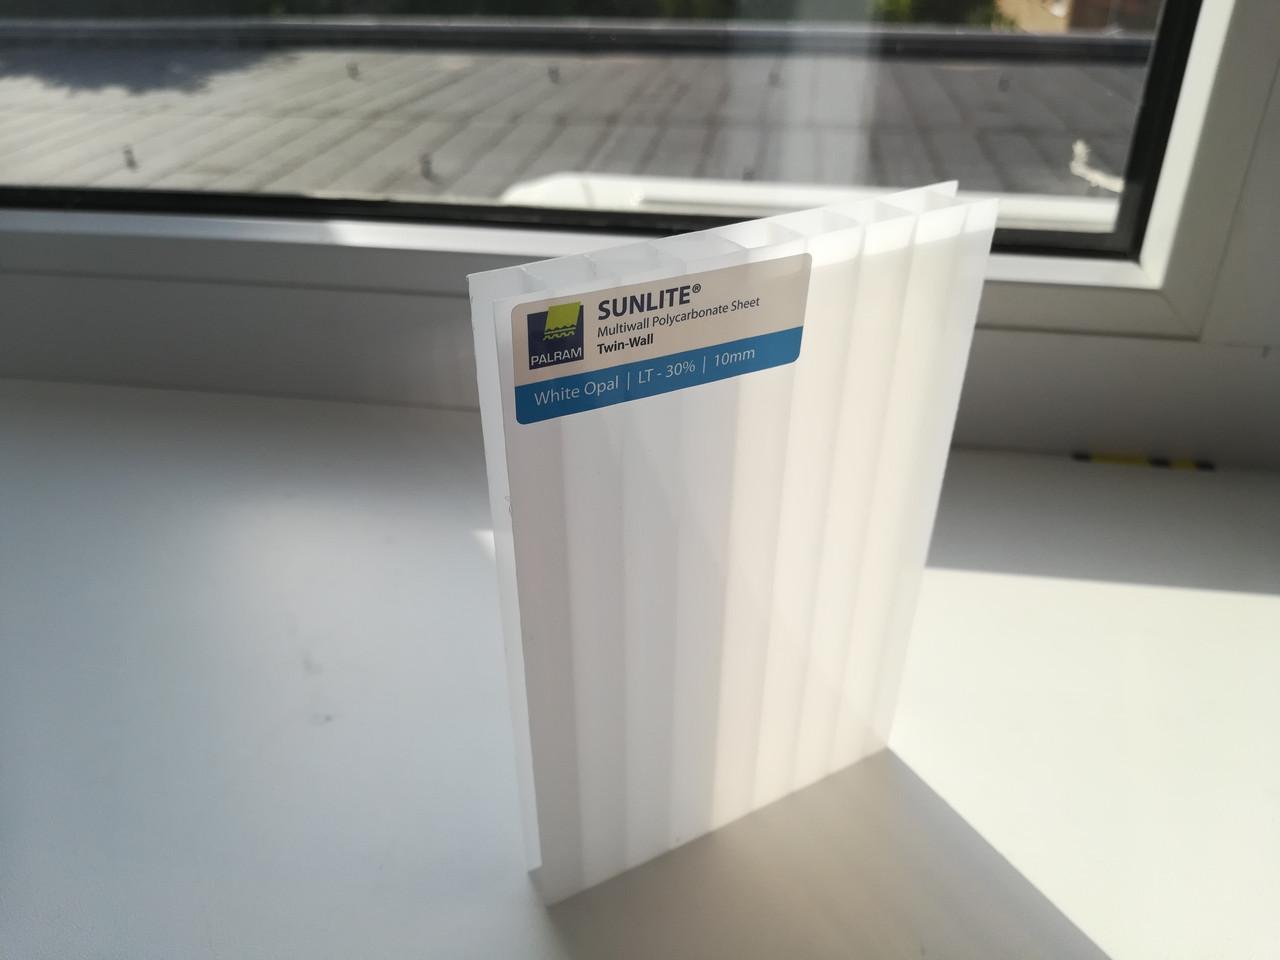 Поликарбонат сотовый Sunlite Twin-Wall 10 mm Opal